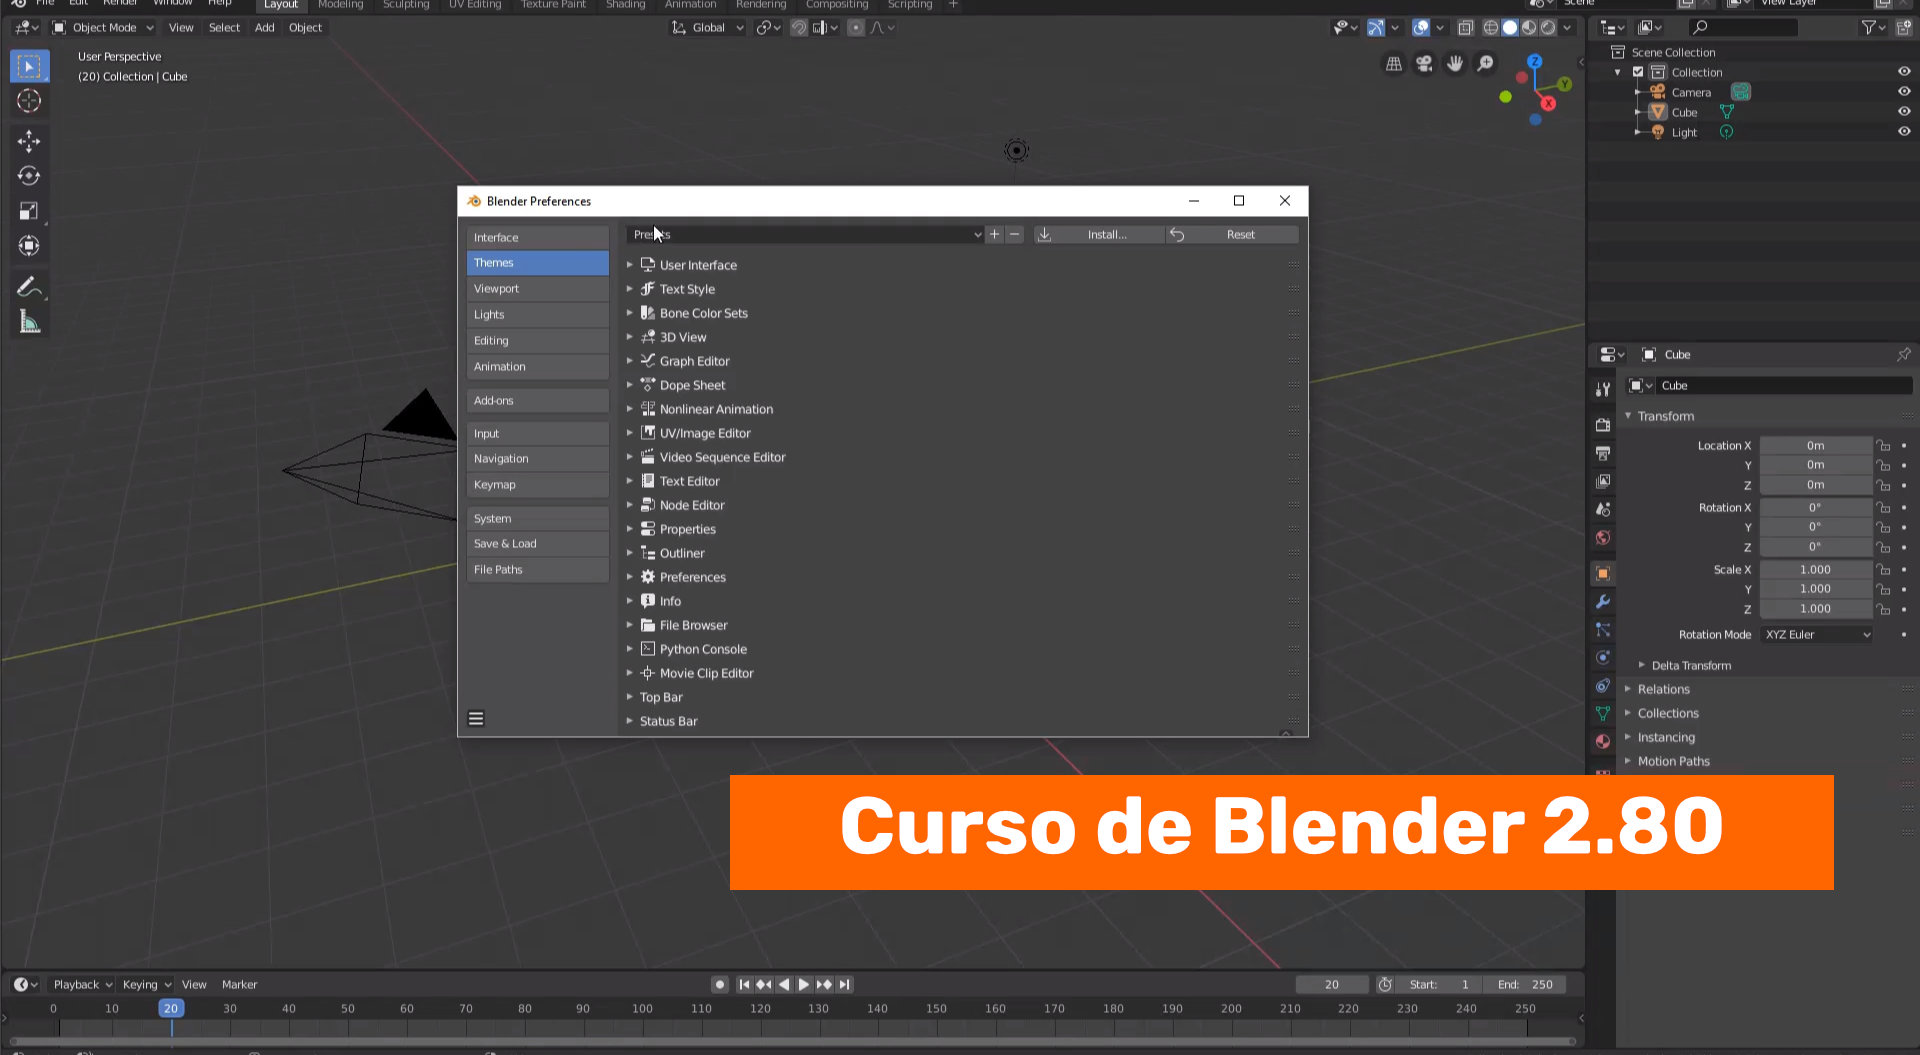 Personalizando la interface de Blender 2.80